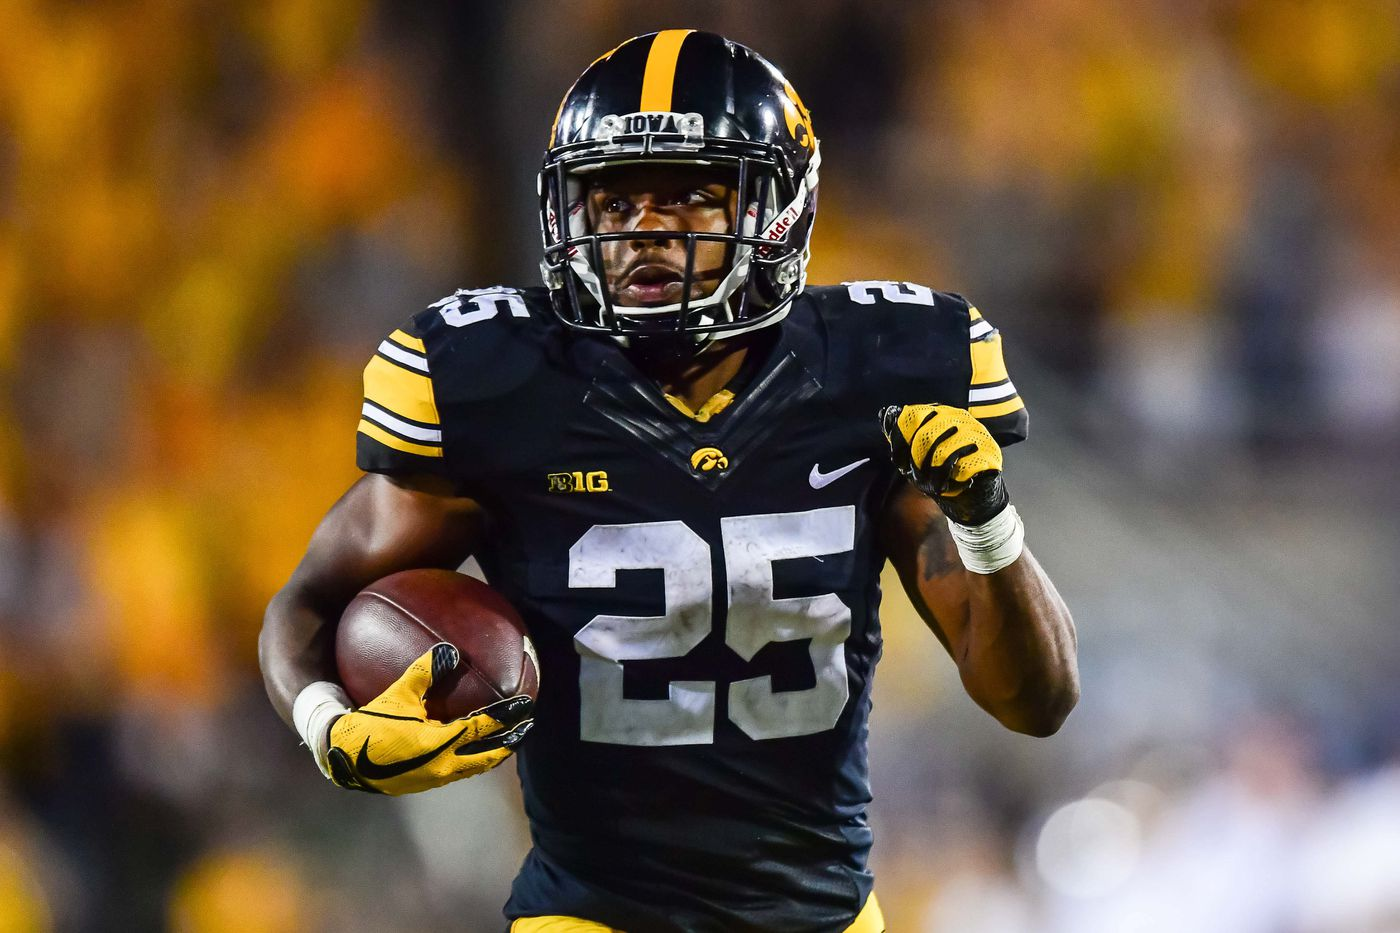 sale retailer 4f1c3 cc742 Steelers throwback uniform looks just like Iowa's: Photo of ...